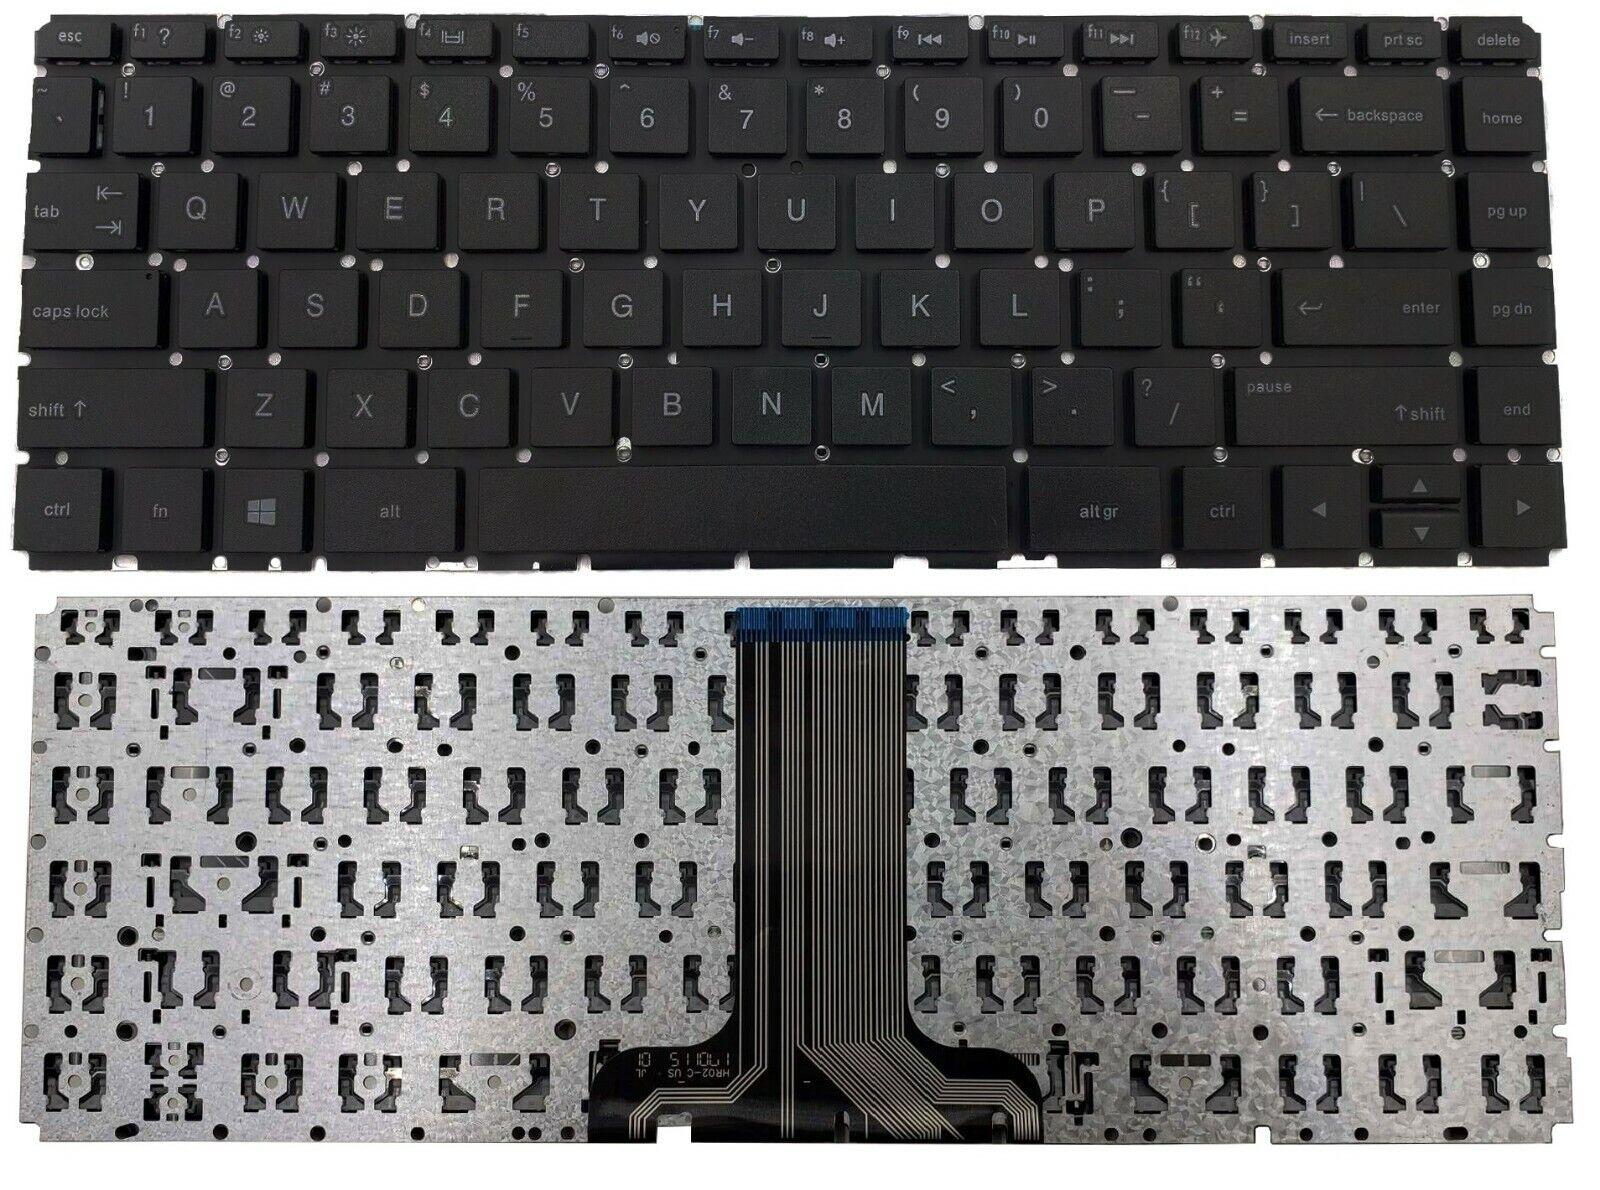 HP Pavilion 17-E185NR HP Pavilion 17-E188NR Keyboards4Laptops UK Layout Glossy Black Frame Black Windows 8 Laptop Keyboard for HP Pavilion 17-E184CA HP Pavilion 17-E187NR HP Pavilion 17-E184NR